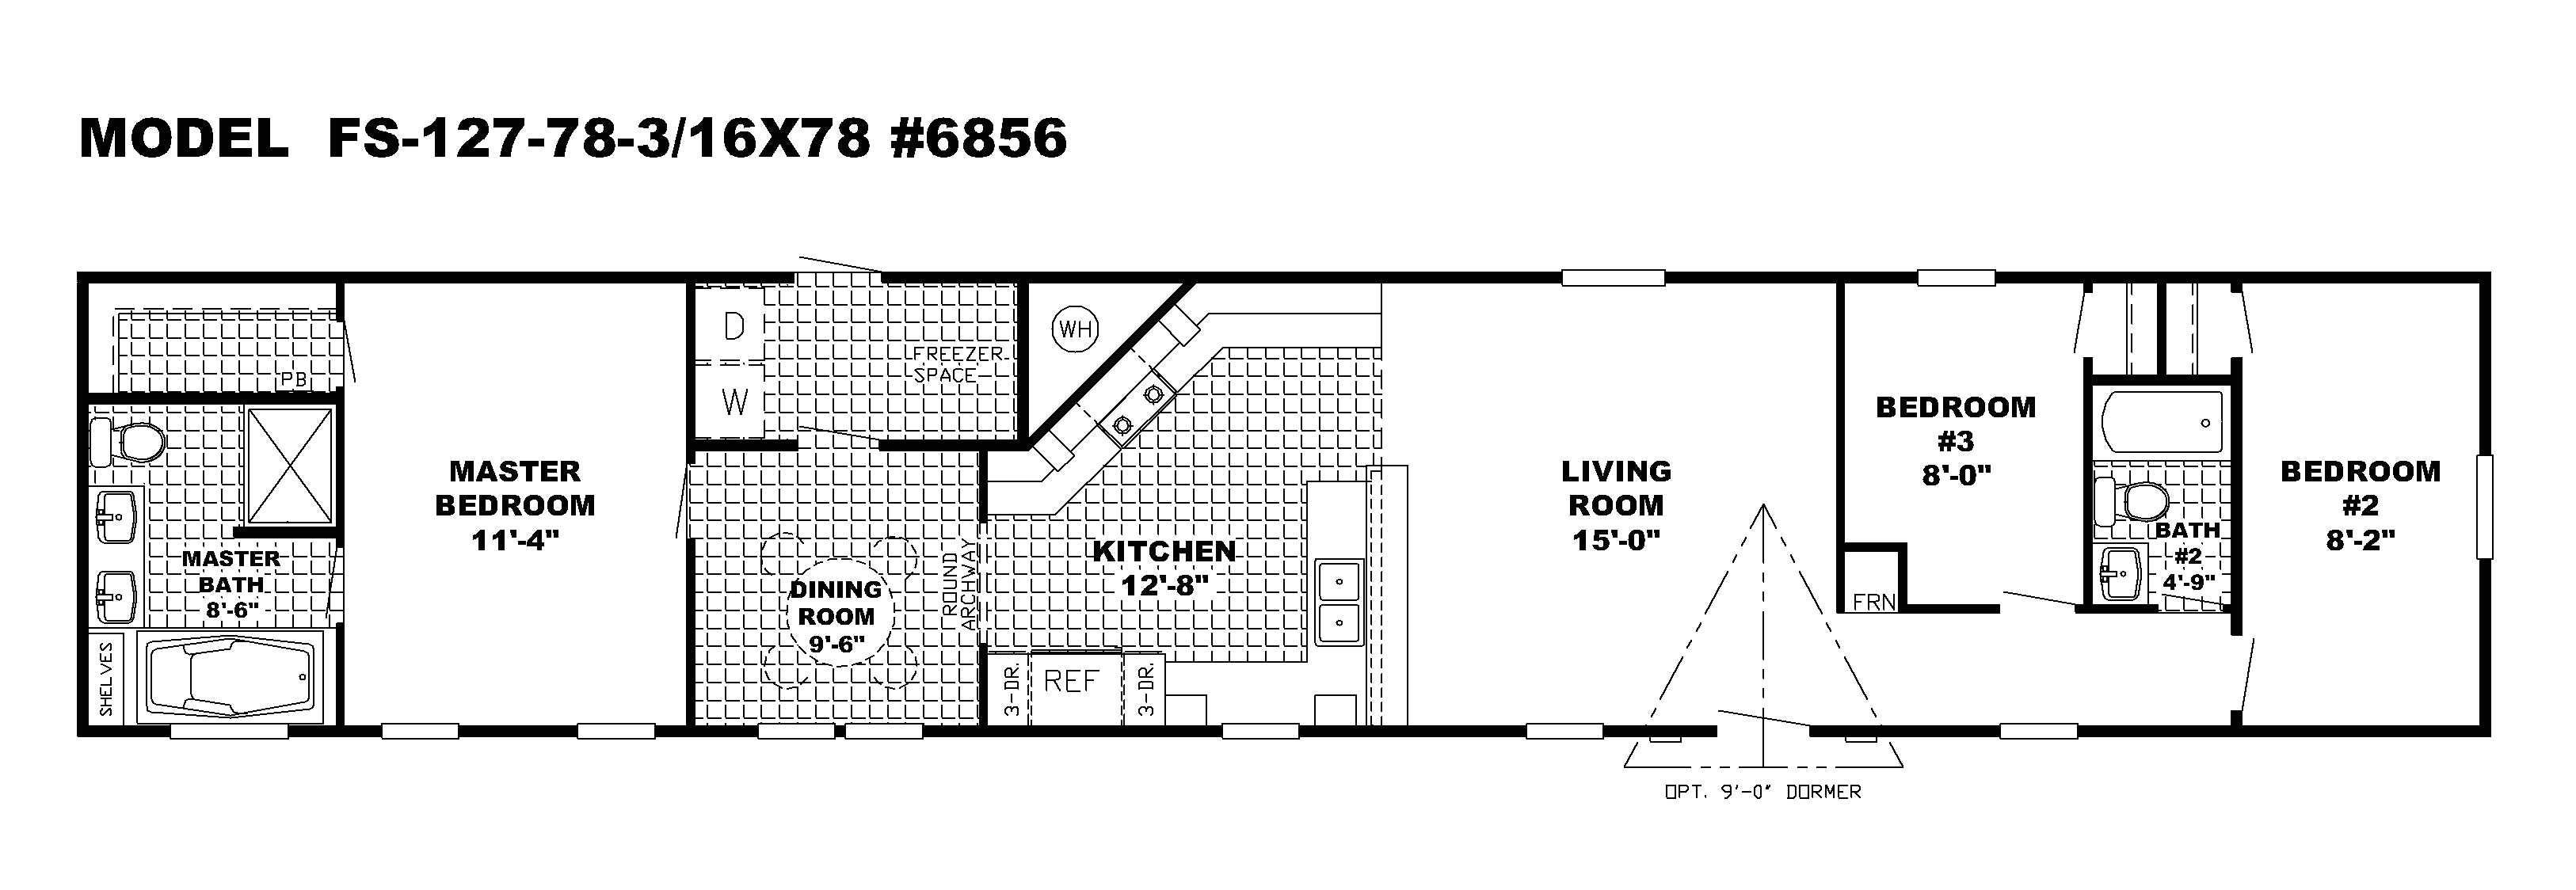 2 bedroom single wide mobile home floor plans